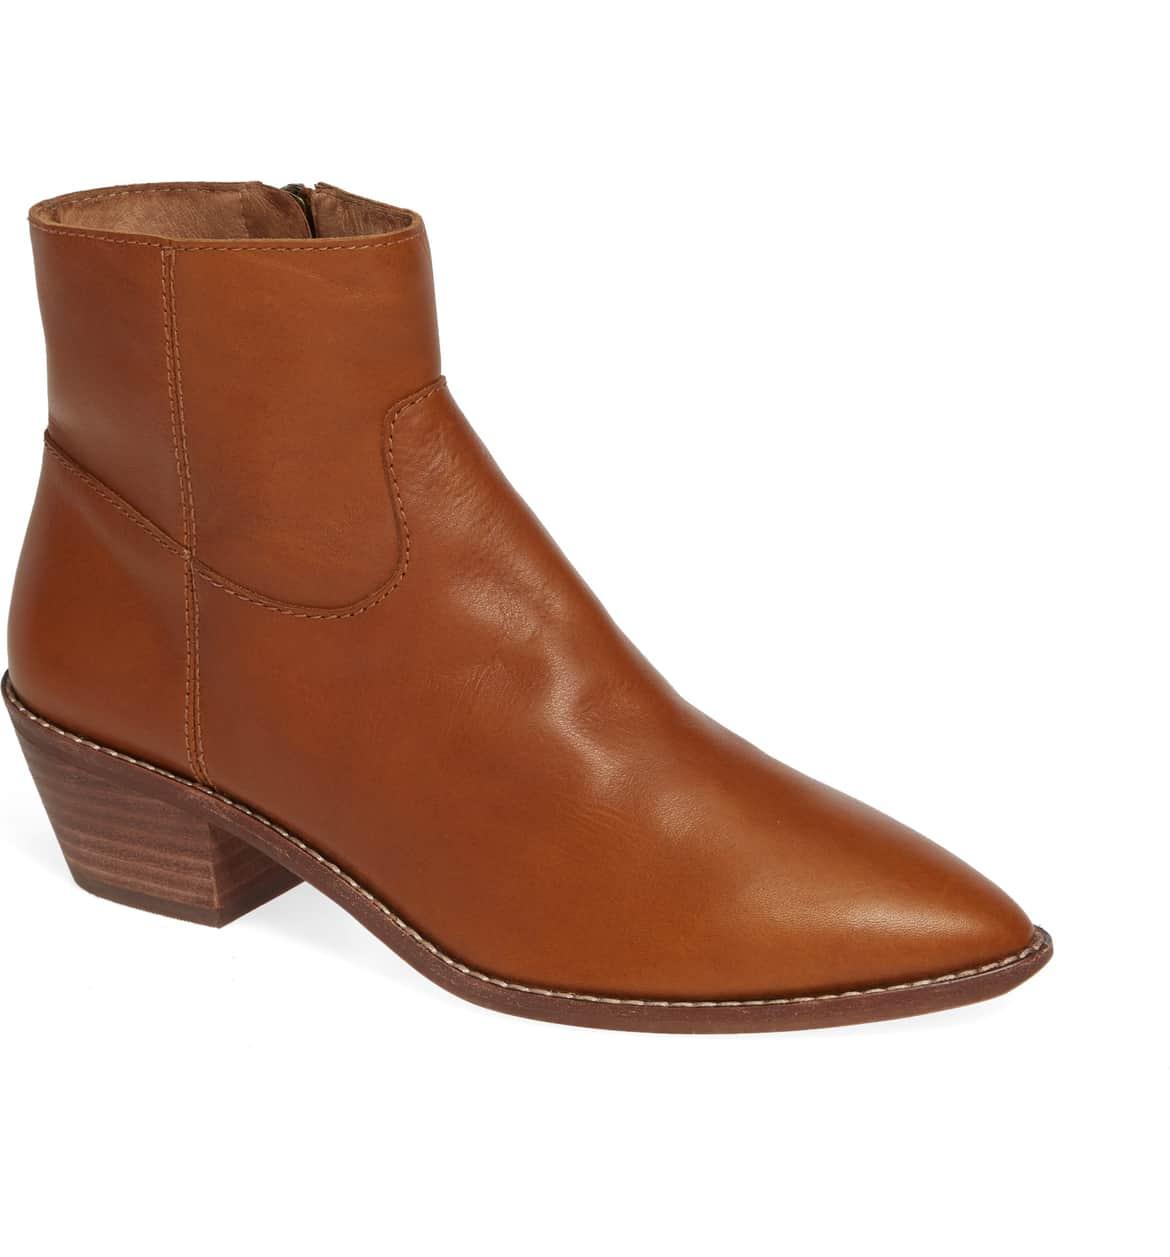 Madewell Charlie Boot